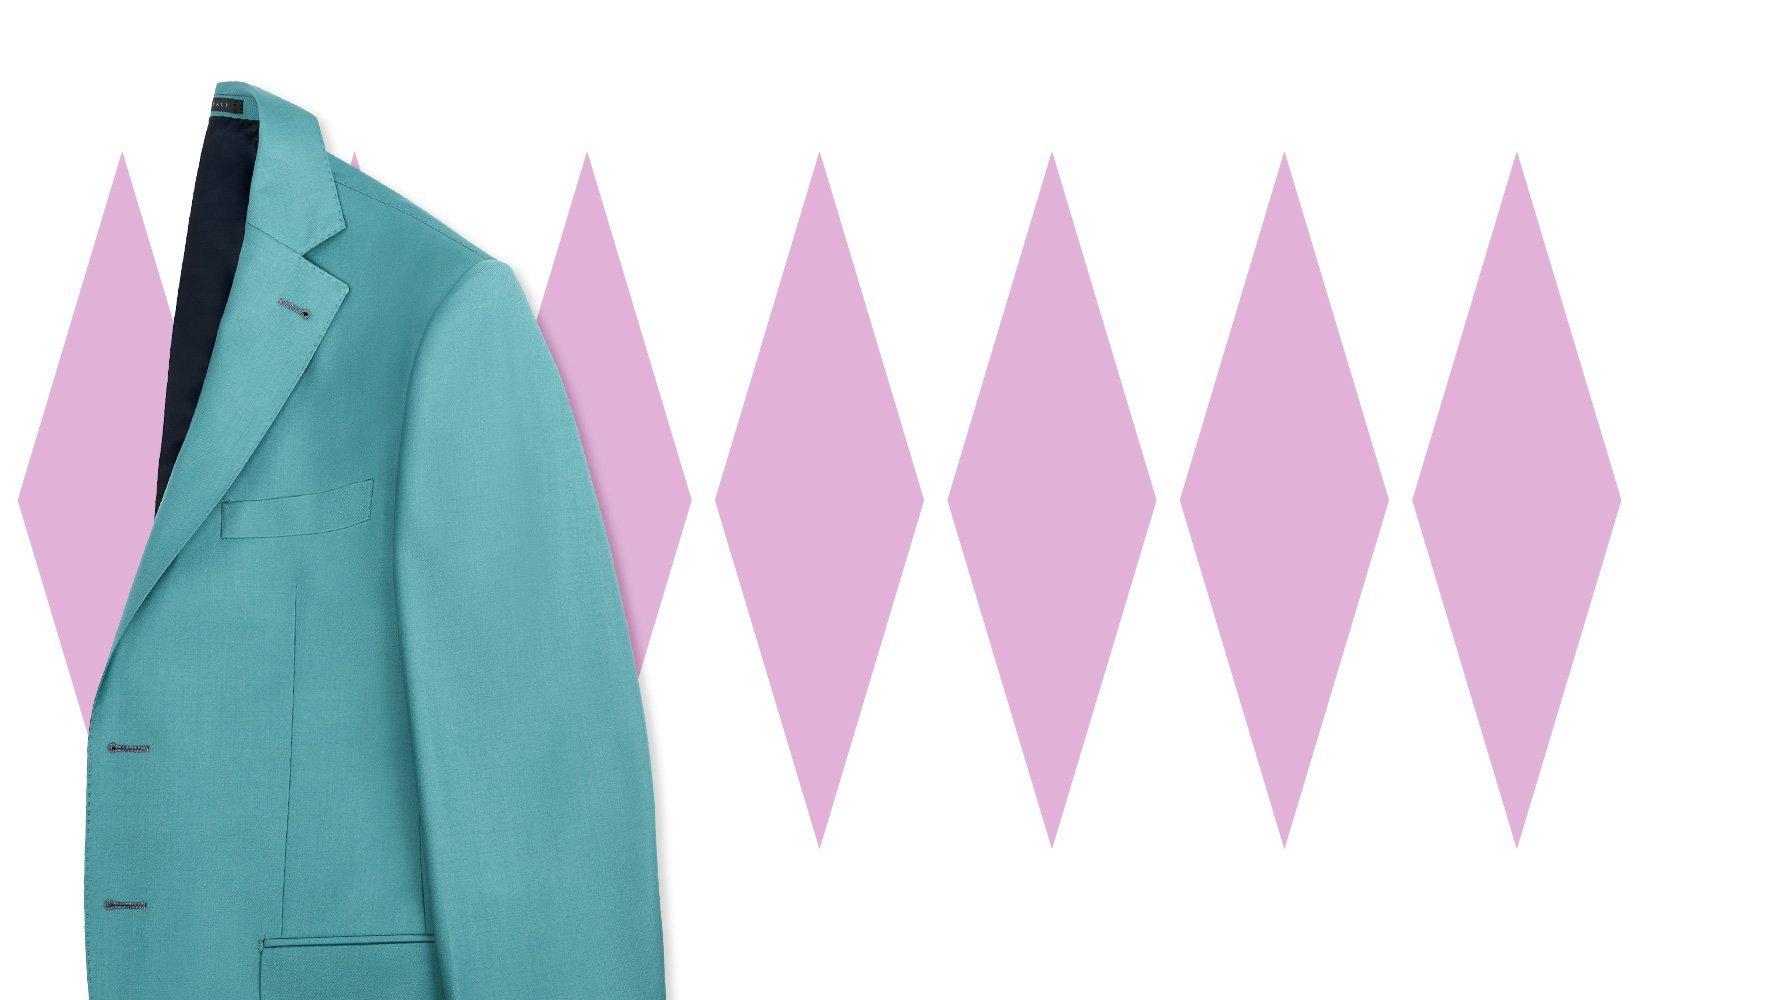 9388f84ef672 Lanieri | Custom Suits, Dress Shirts - Italian Made to Measure Clothing